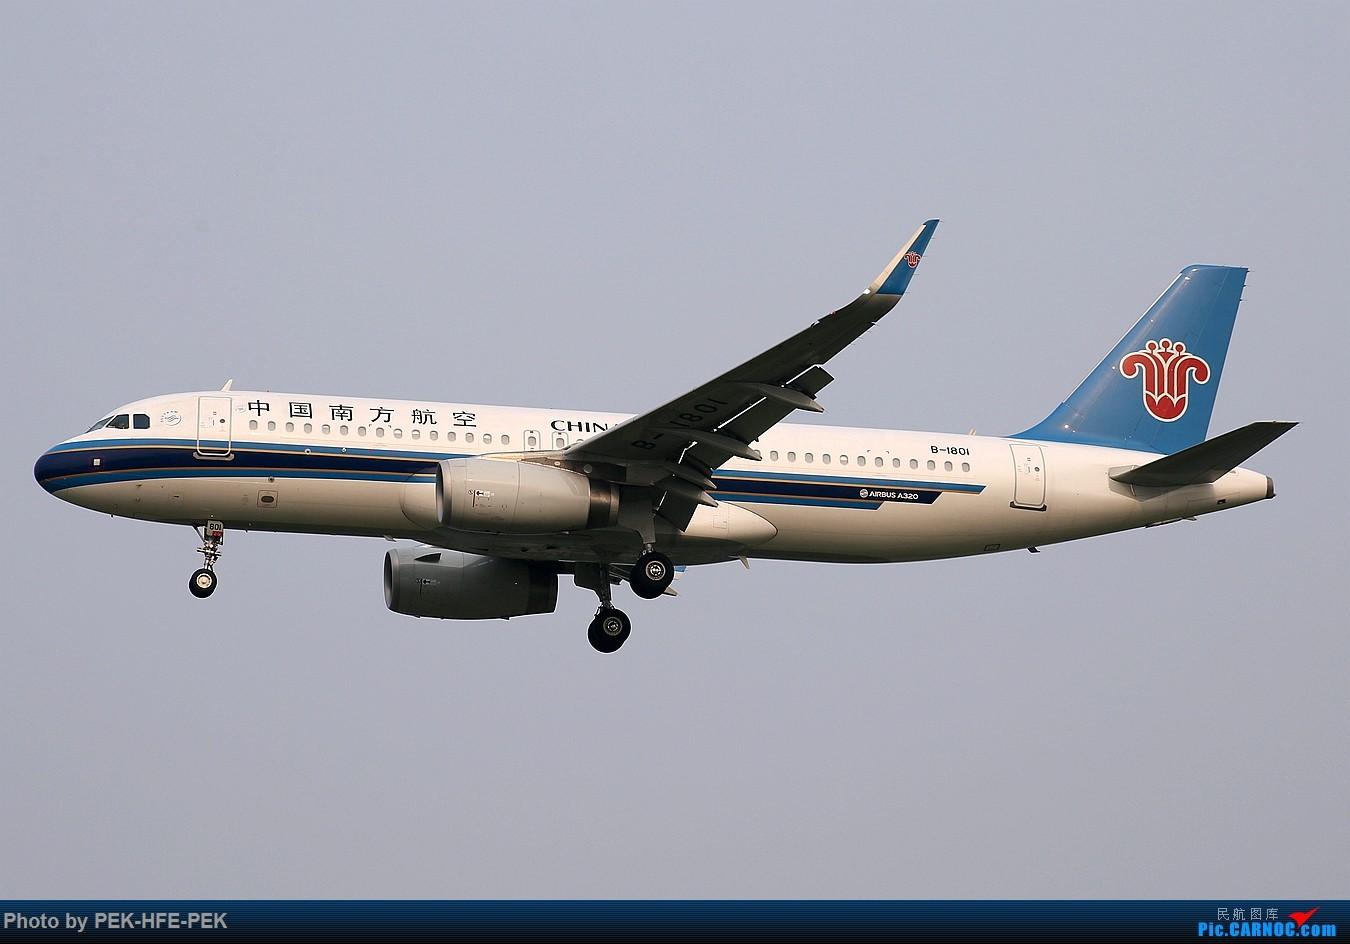 Re:[原创][AutumnKwok]南航B-1801图一组 AIRBUS A320-200 B-1801